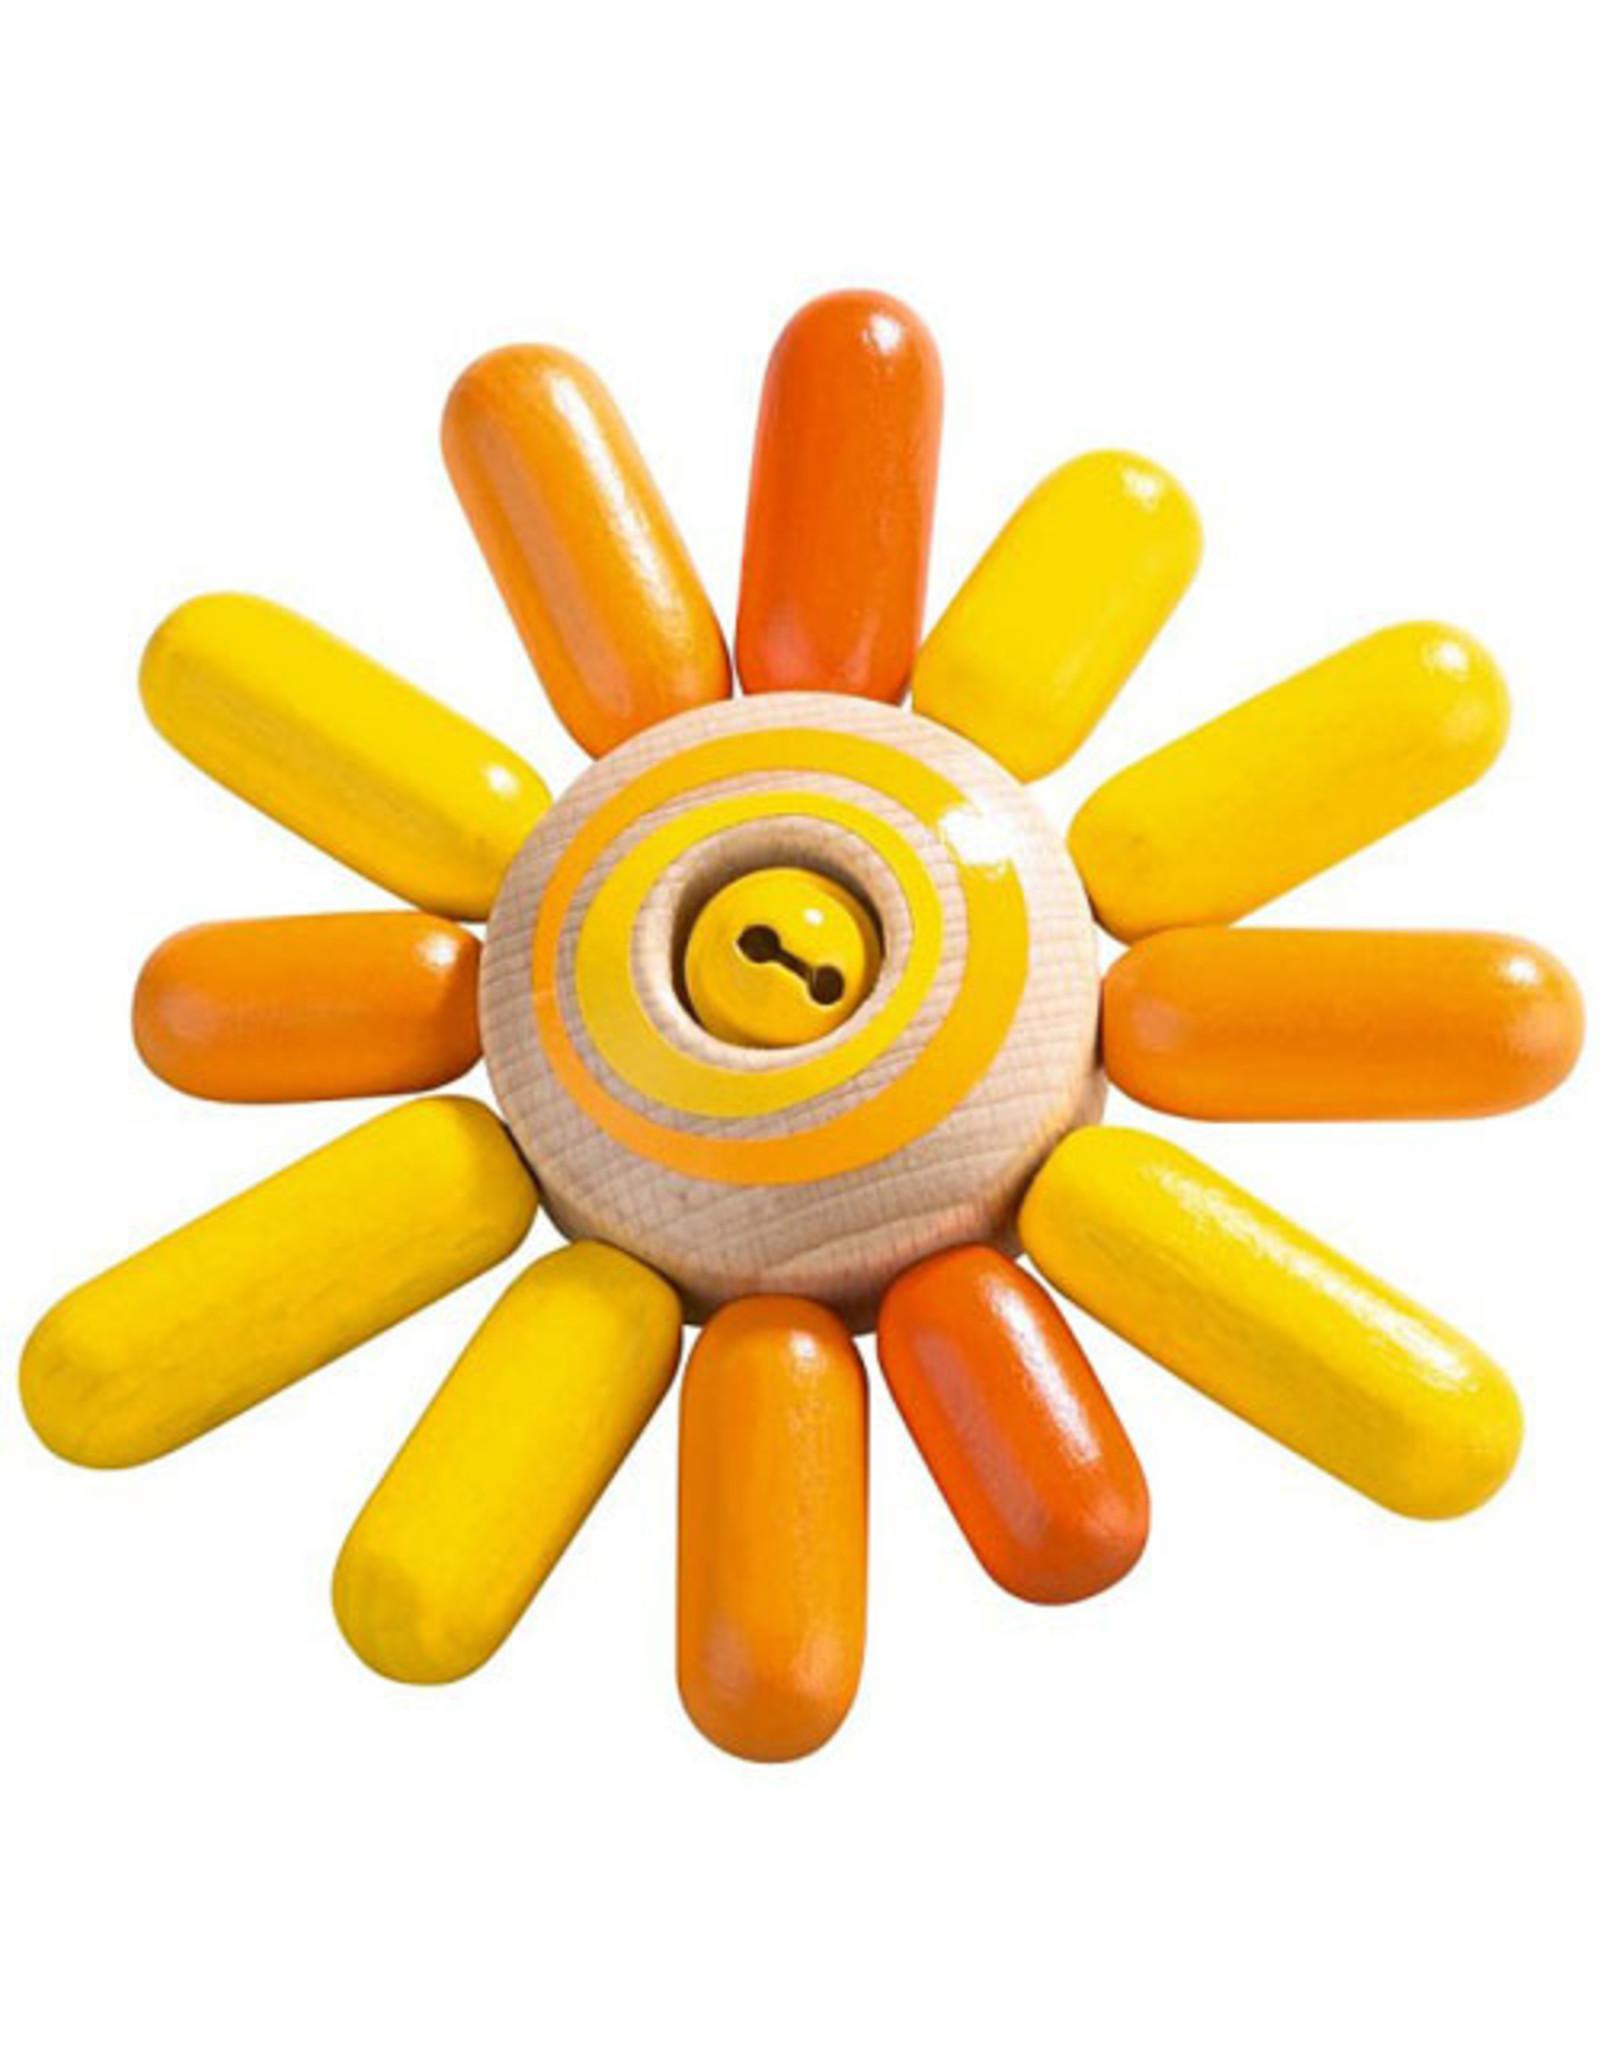 Haba Clutching Toy - Sunni